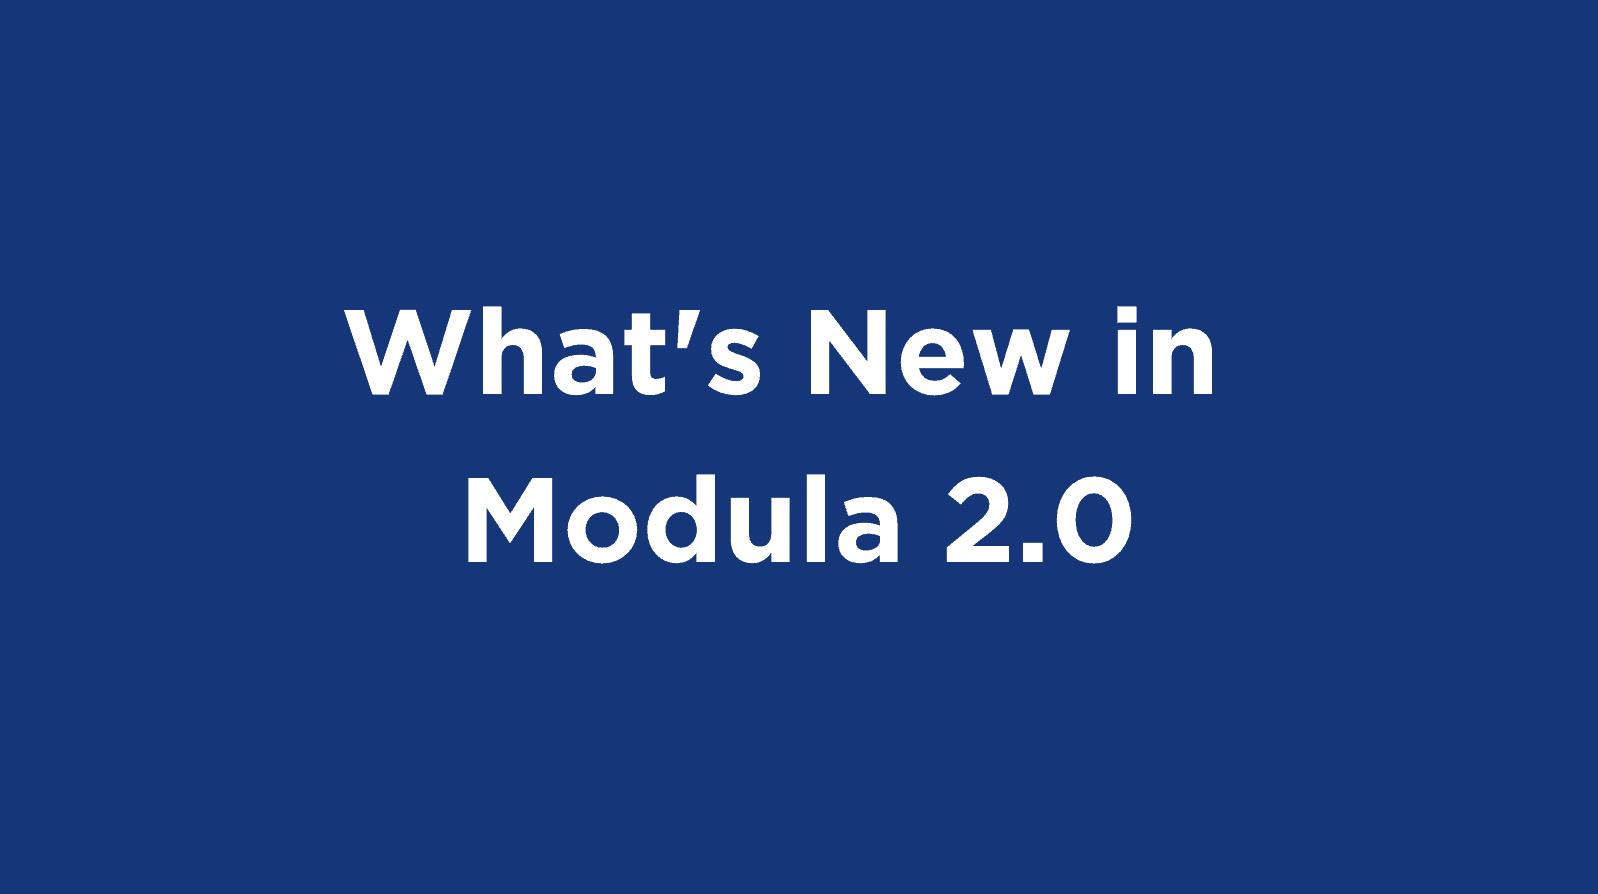 modula-2.0